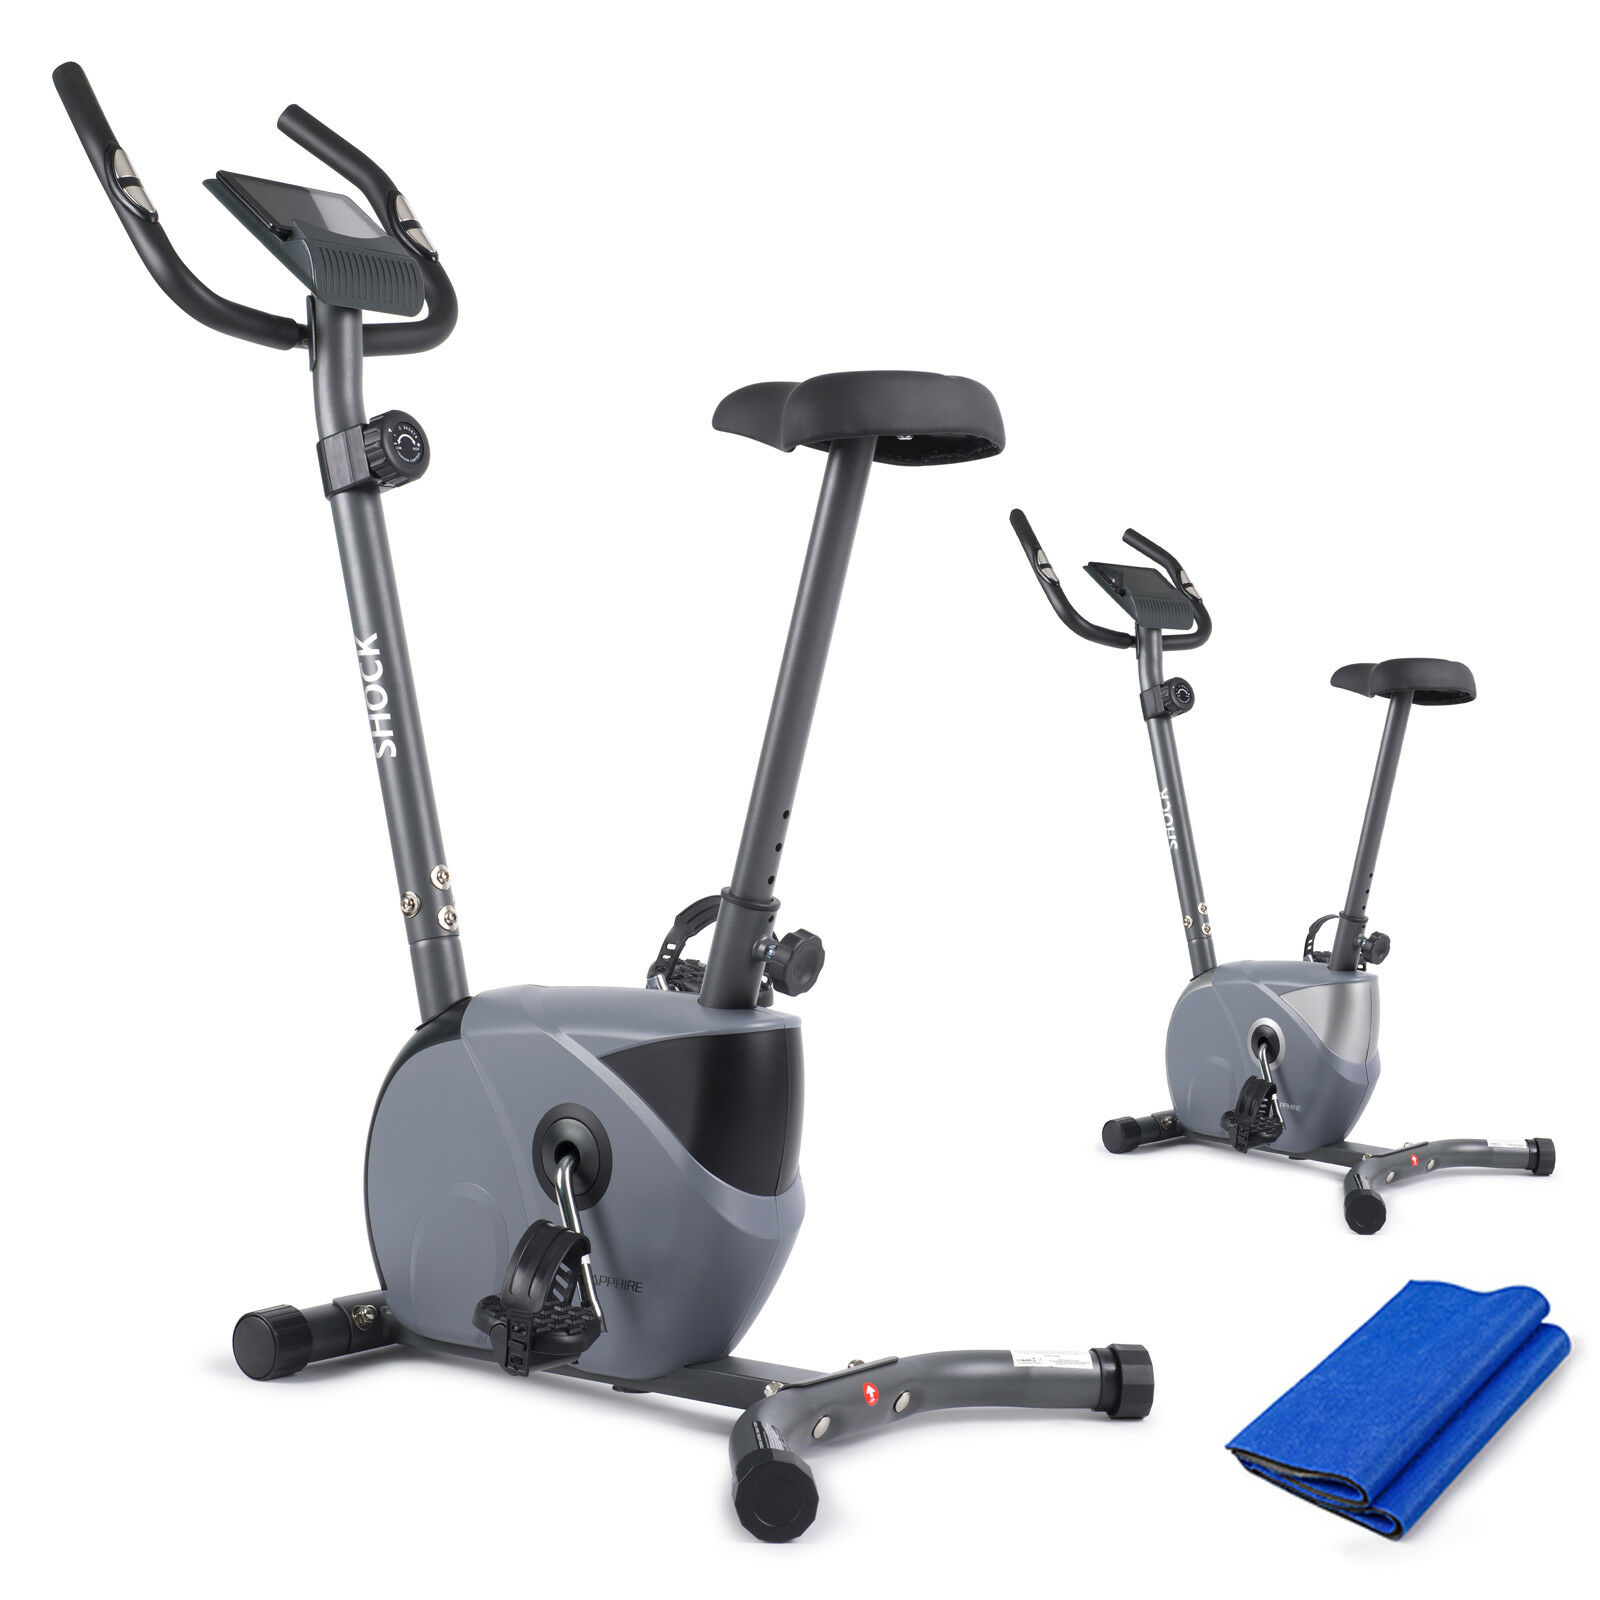 Heimtrainer Fitness Fahrrad Hometrainer Ergometer Trimmrad Bike Trimmrad 130 kg✔️GRATIS✔️ bis 130 kg✔️Pulsmessung✔️LCD Display✔️NEU